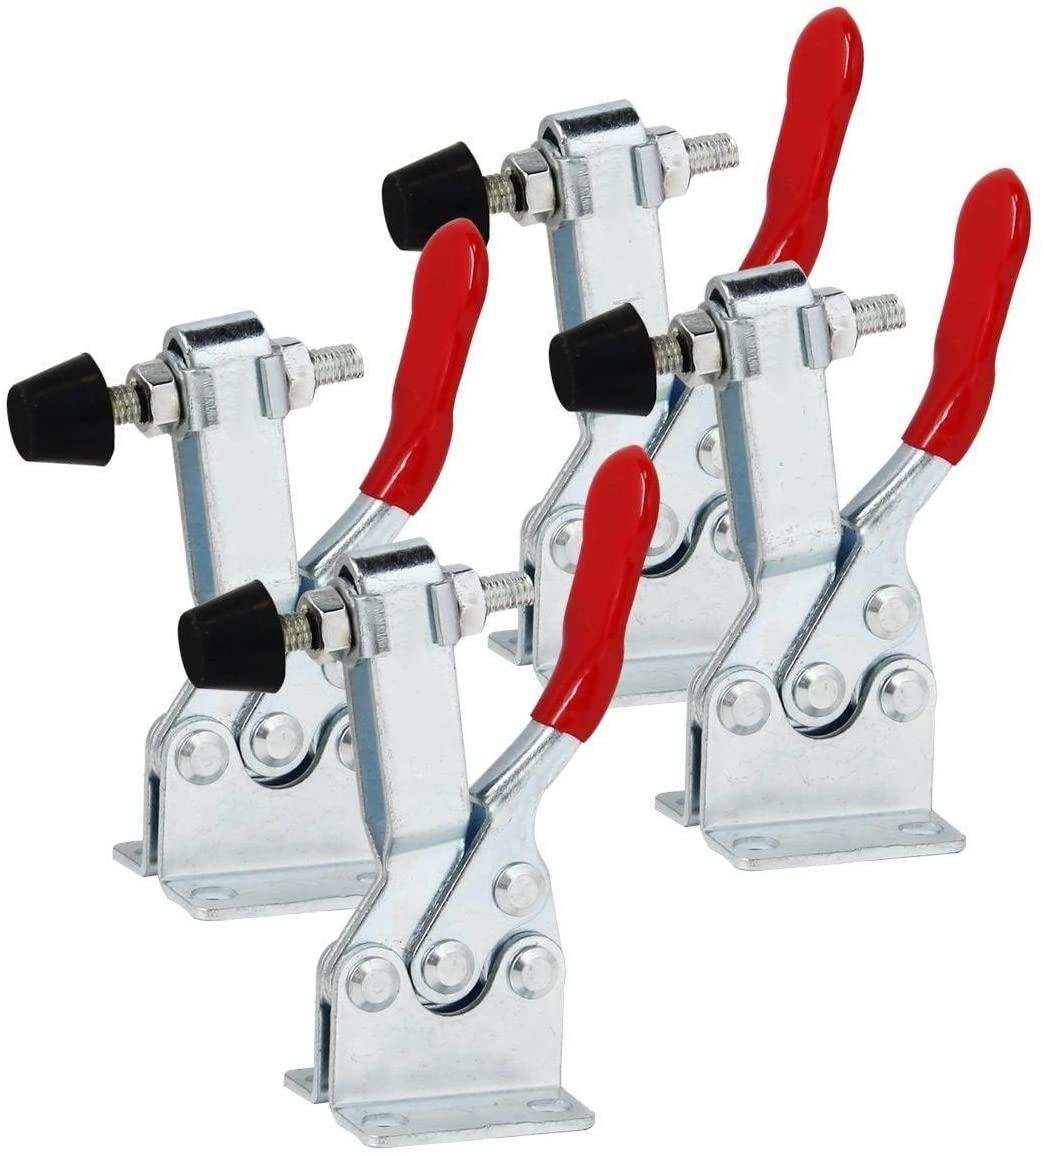 Driak 4 pcs Holding Capacity 100Kg Toggle Clamp GH-201B Iron–galvanized Antislip Red Horizontal Quick Push Pull Toggle Clamp for Hand Tool